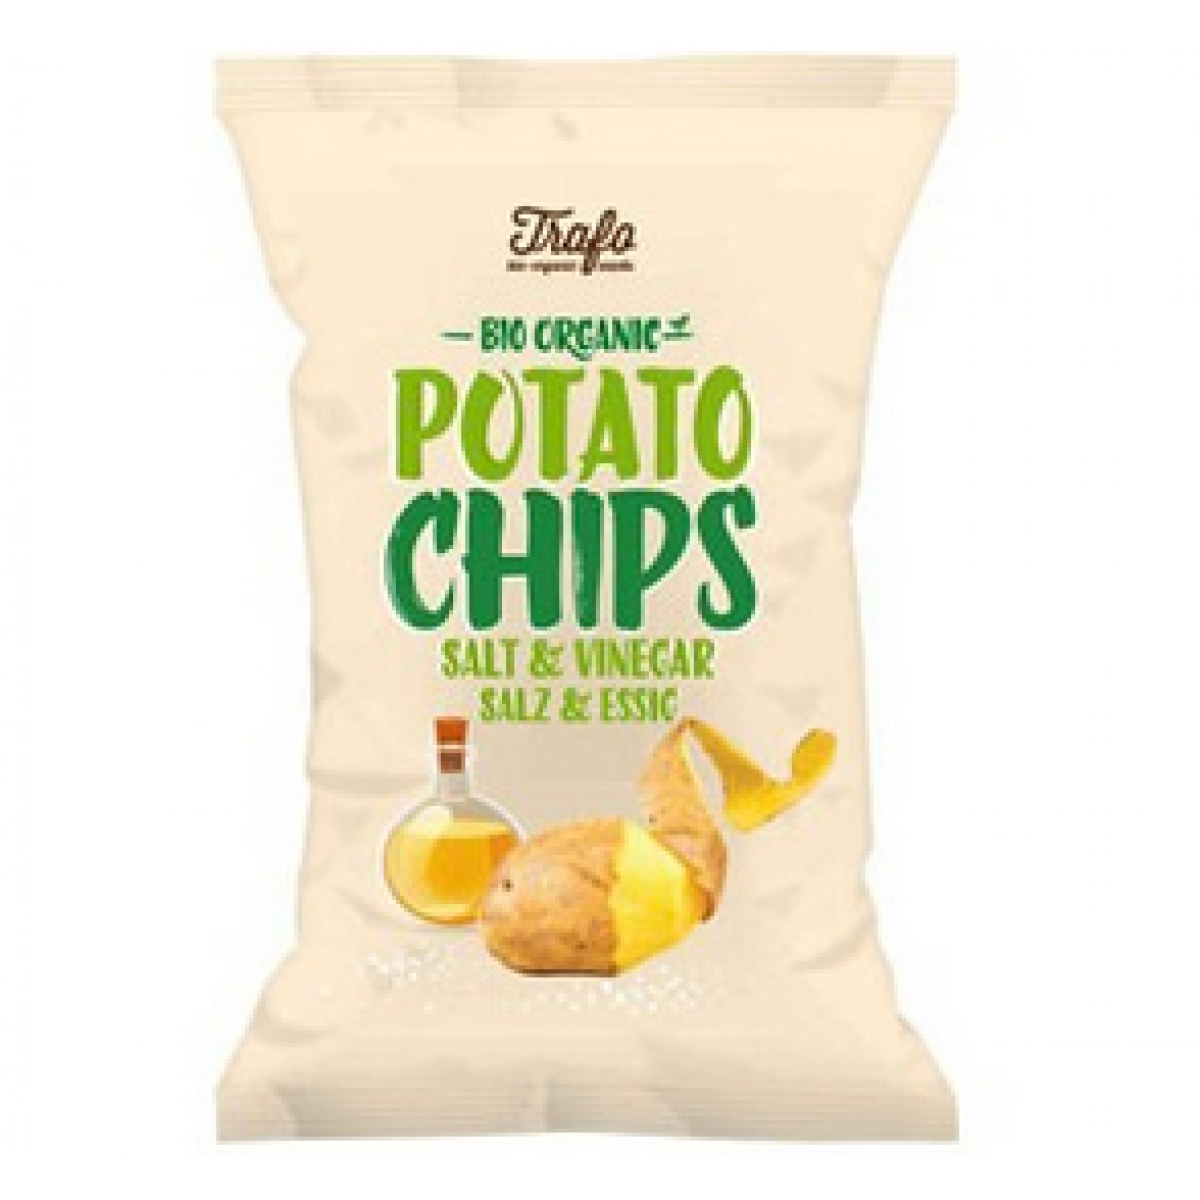 Aardappelchips Salt & Vinegar